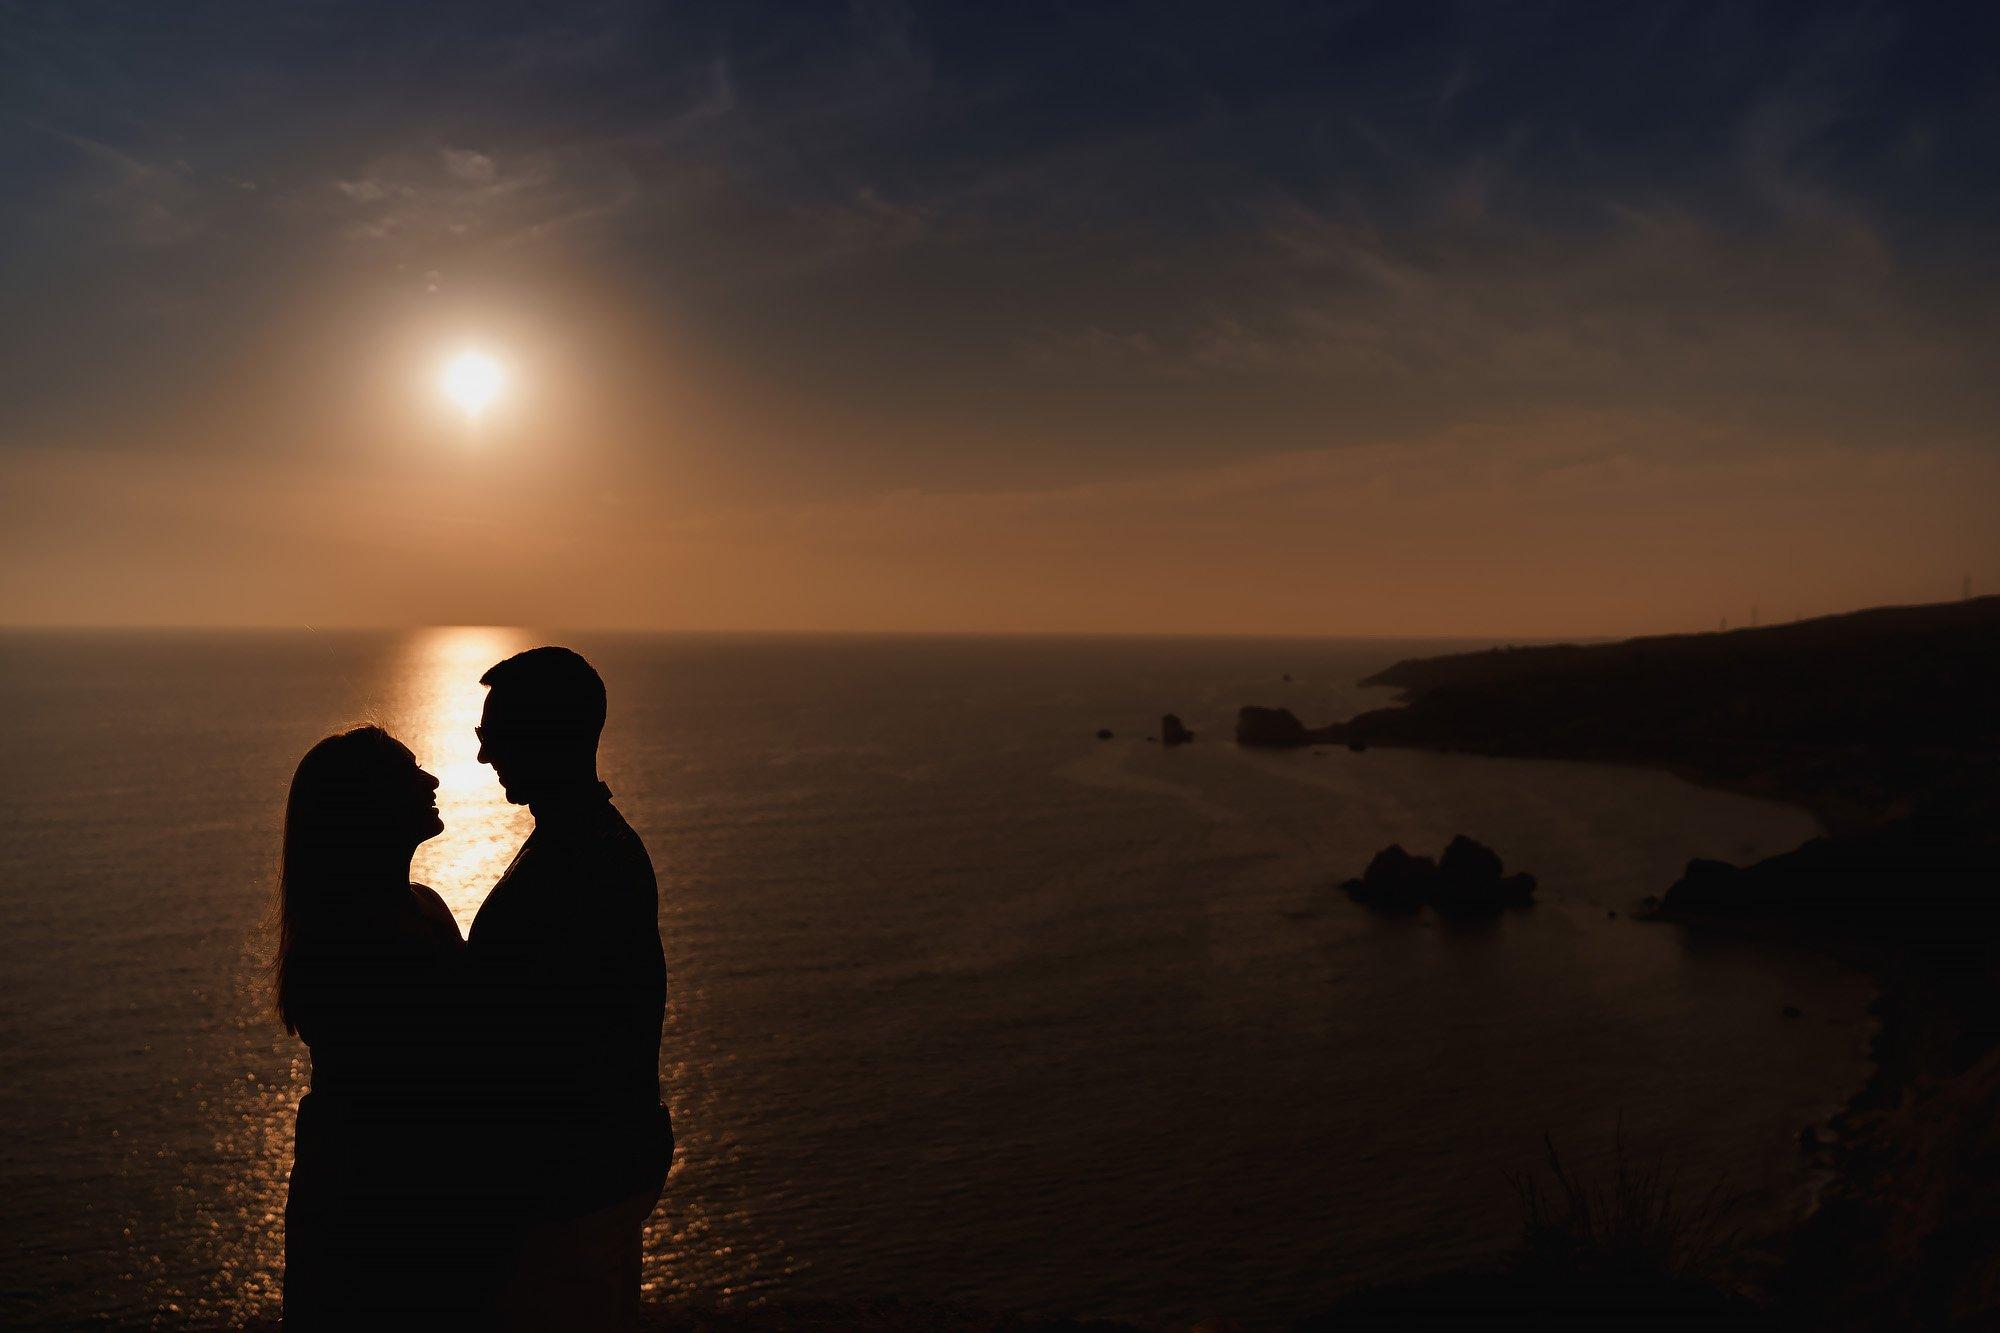 Cyprus kouklia aphrodite's rock engagement shoot - destination wedding photography by arj photography